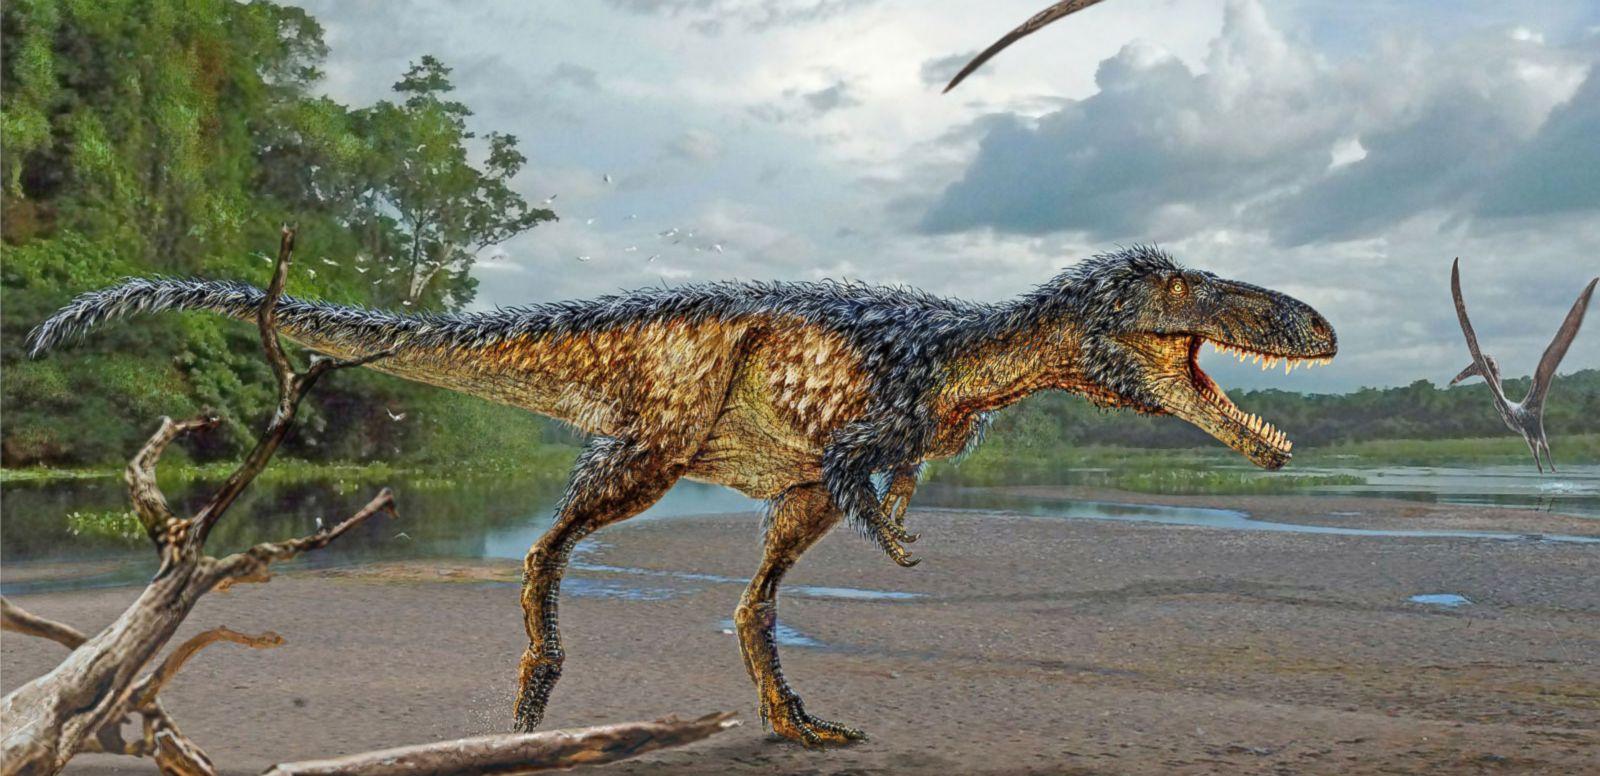 VIDEO: New Tyrannosaur Species Announced